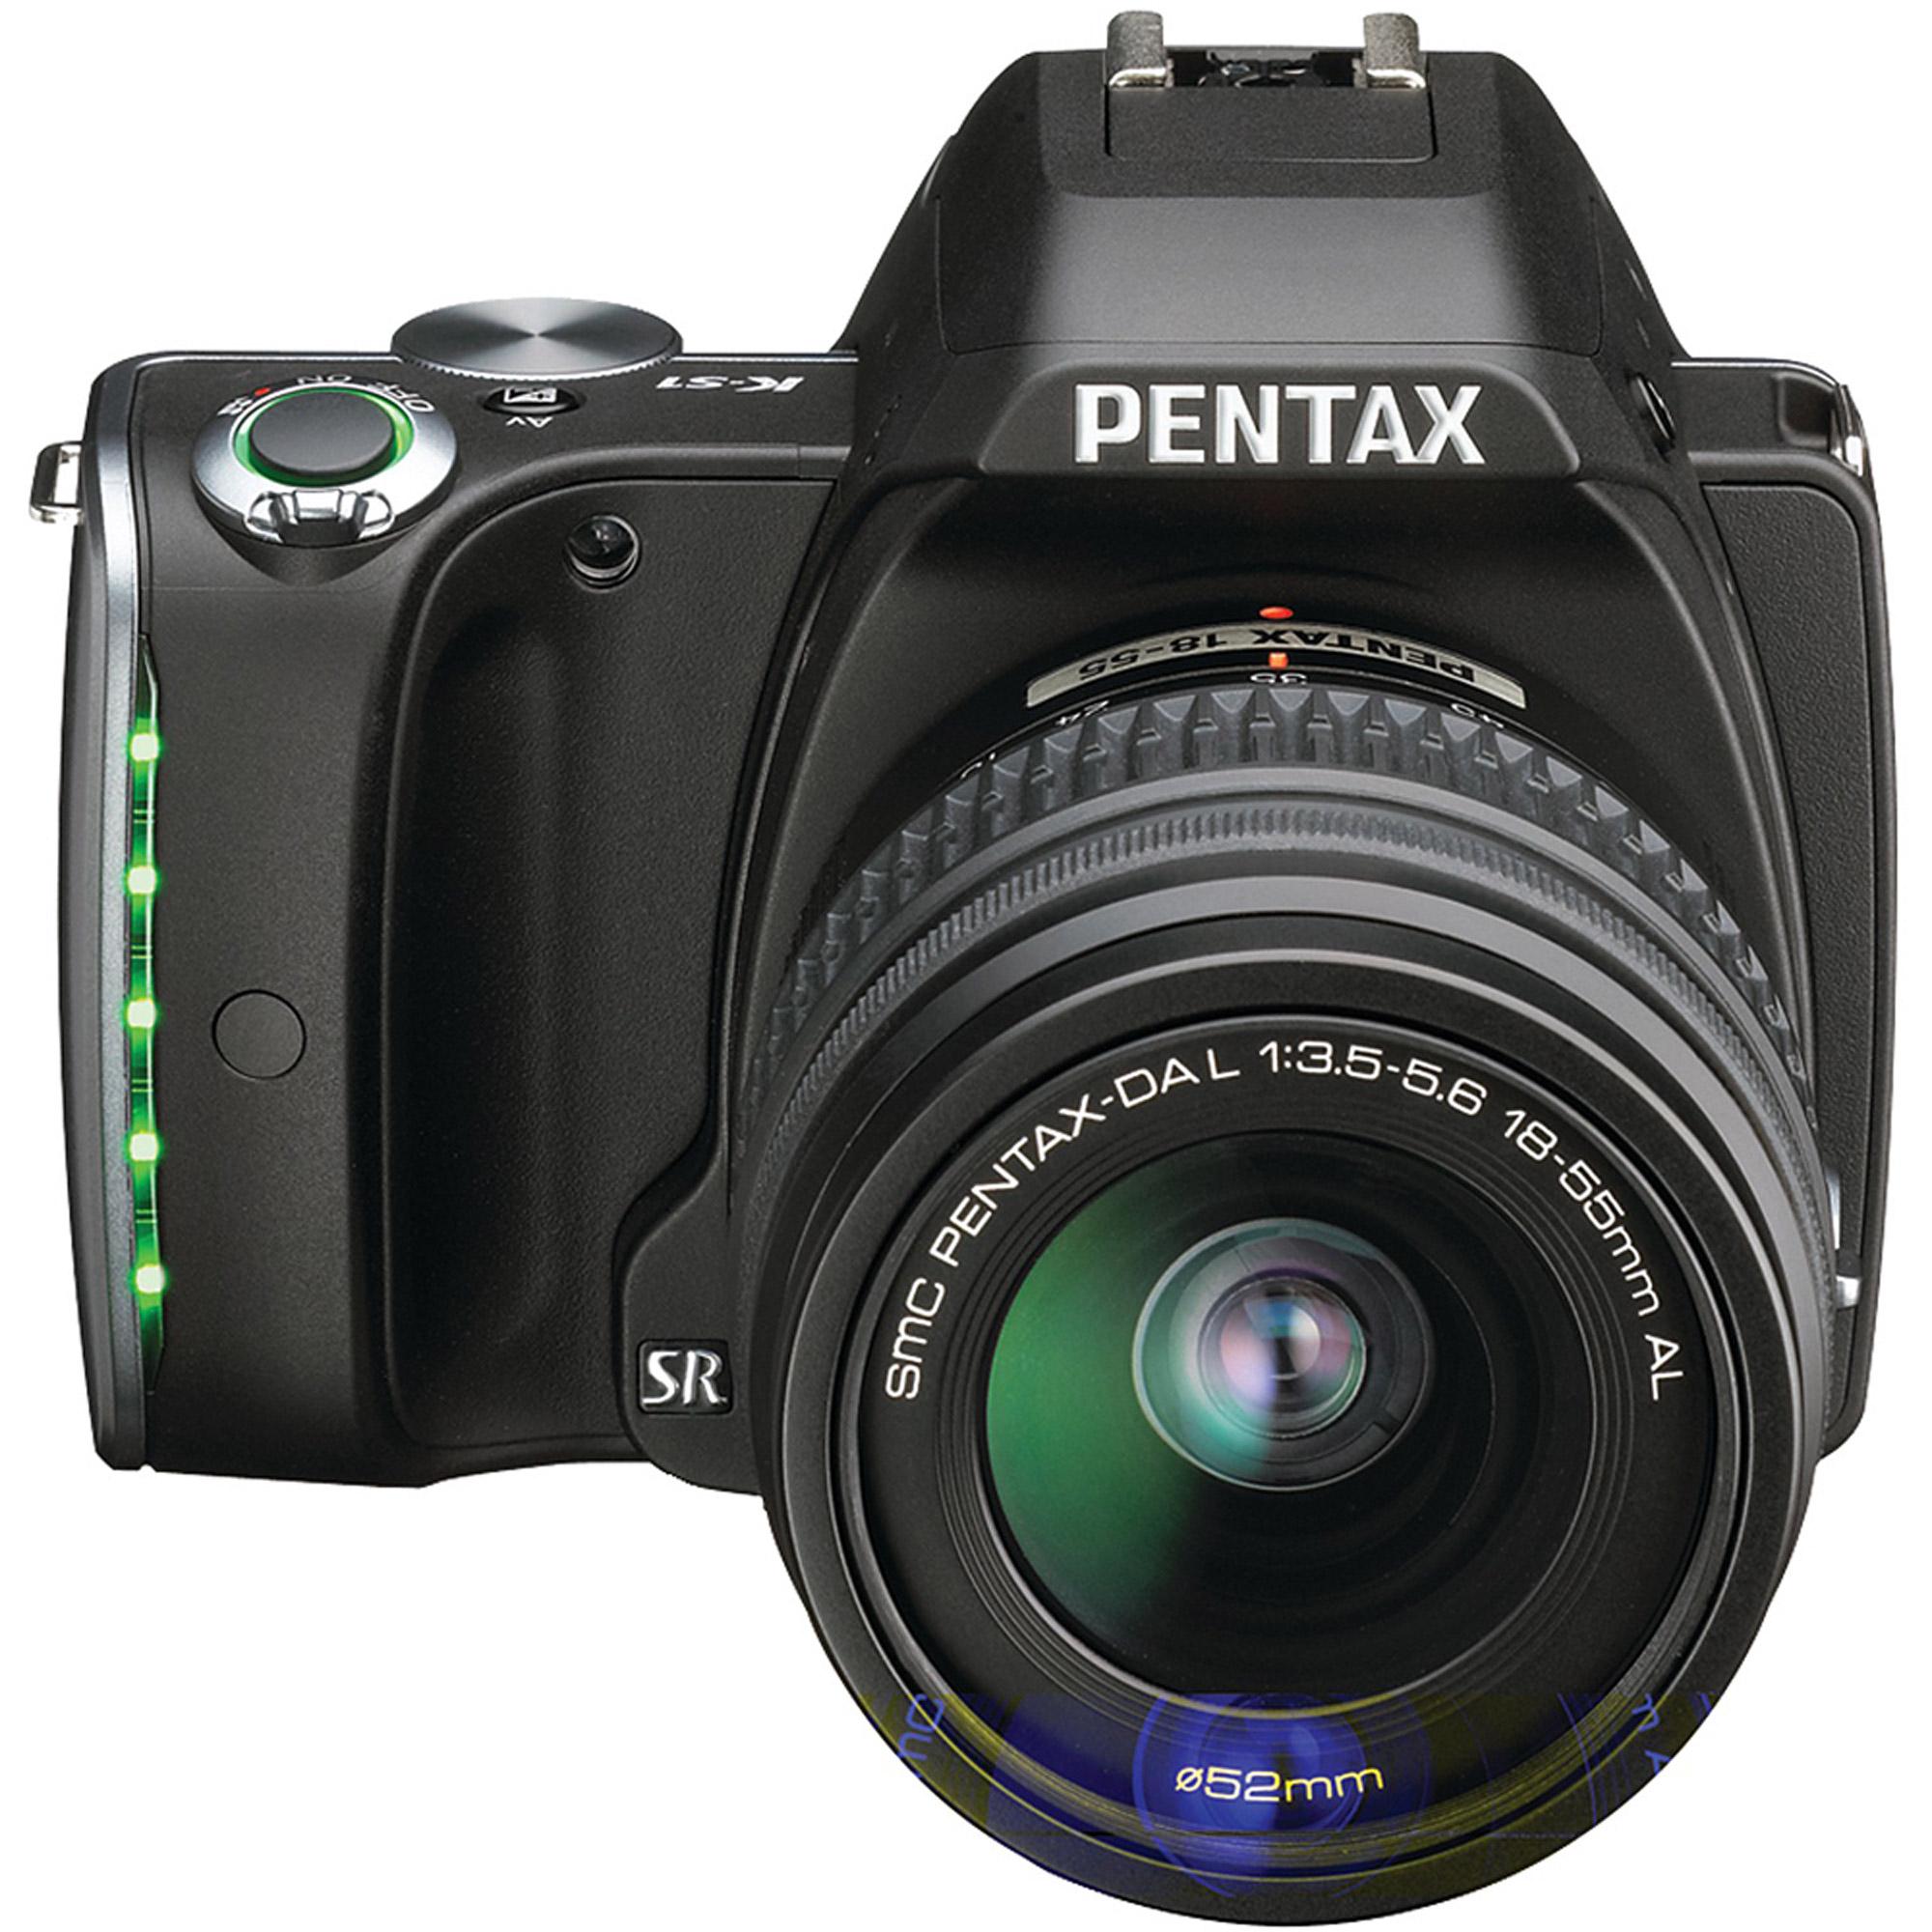 Pentax K-S1 - Digital camera - High Definition - SLR - 20.12 MP - 3 x optical zoom DA L 18-55mm AL lens - black